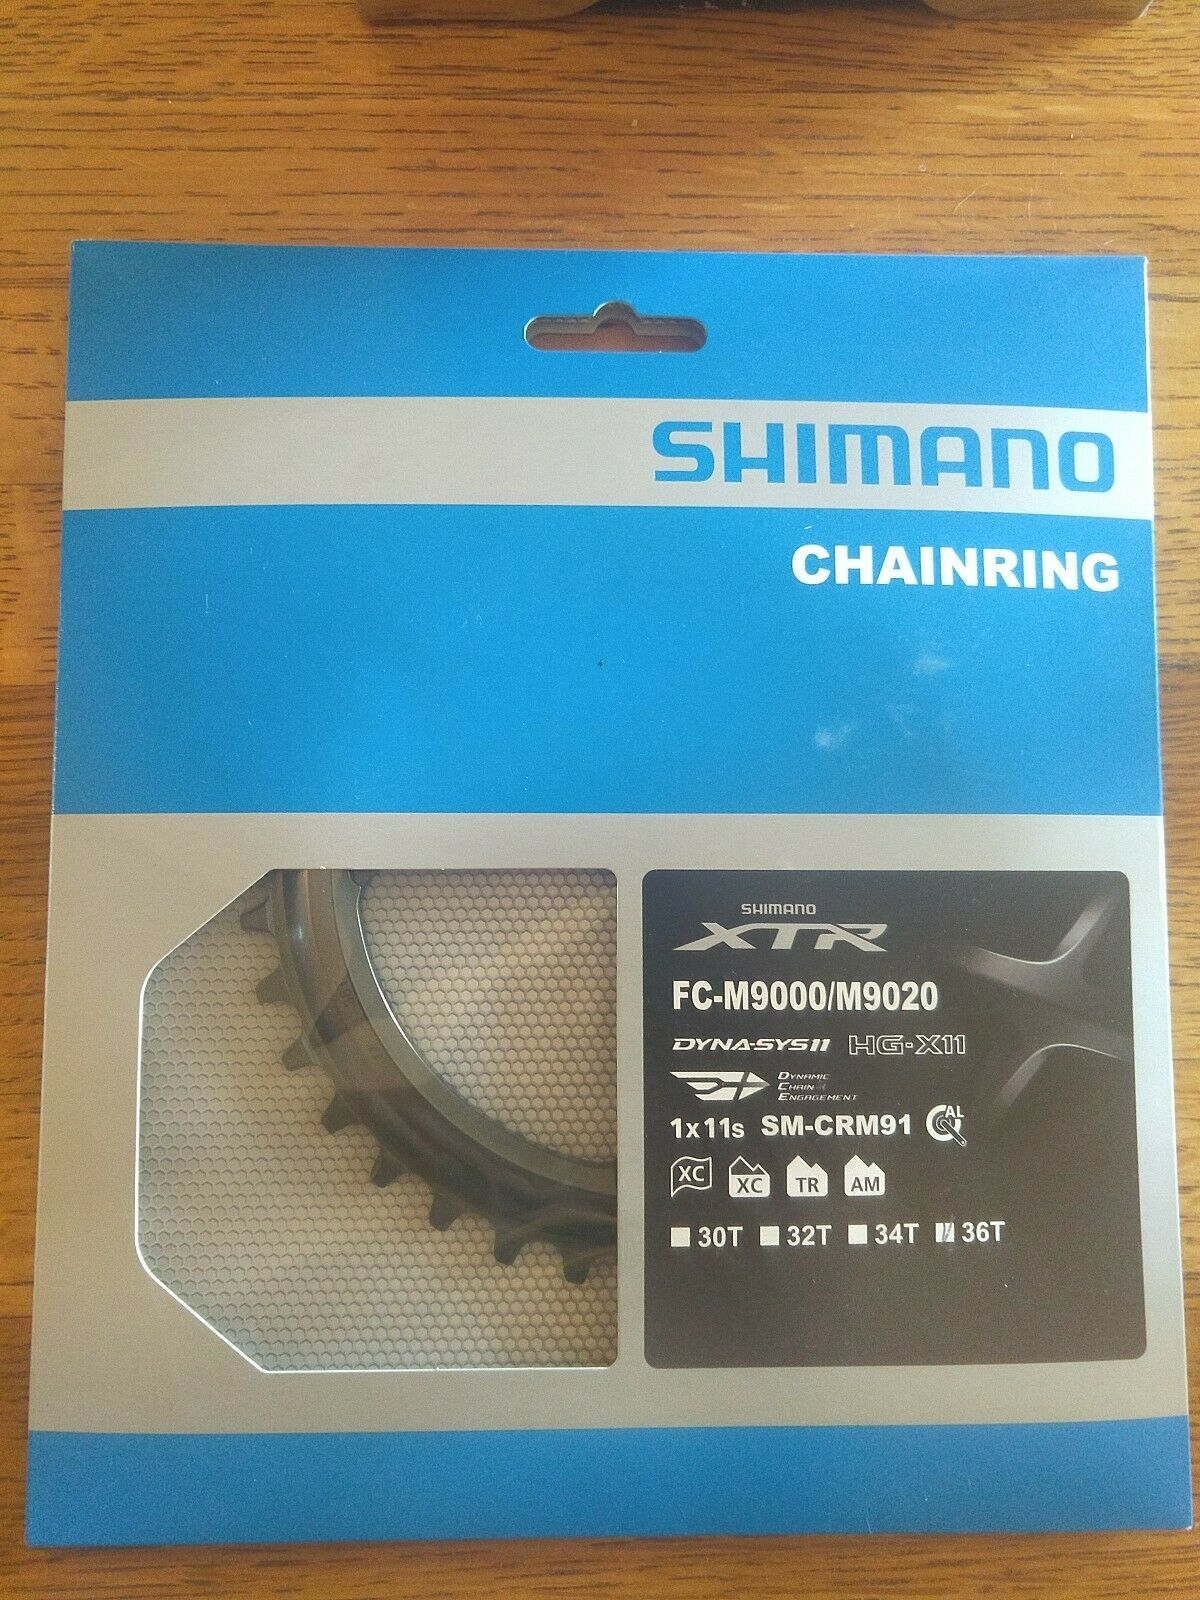 SHIMANO XTR SM-CRM91 solo plato 36T M9000 9020, Nuevo, perfil estrecho ancho